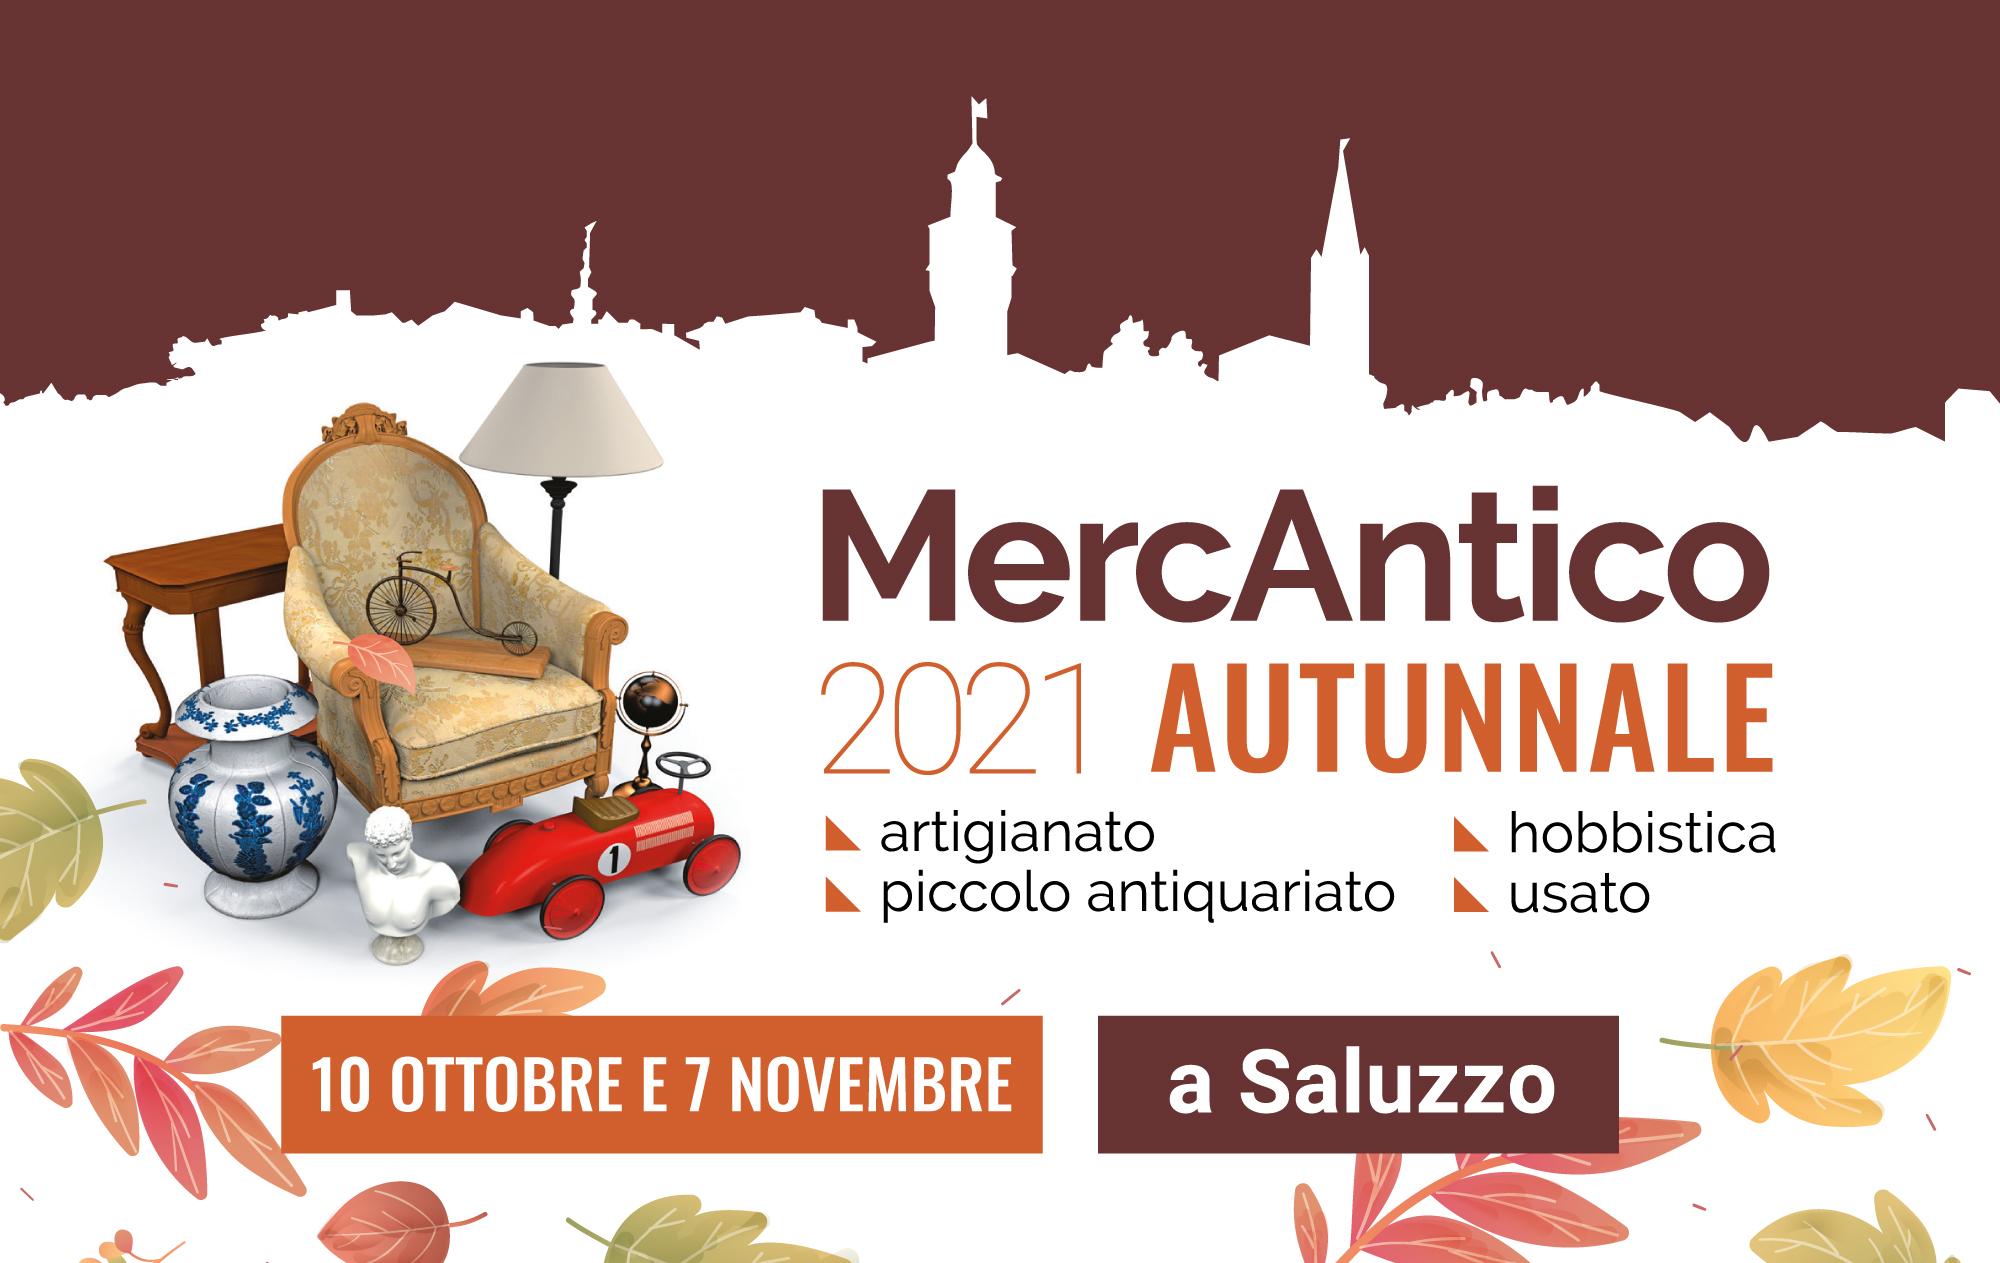 mercantico-cartolina-FR2021-autumn